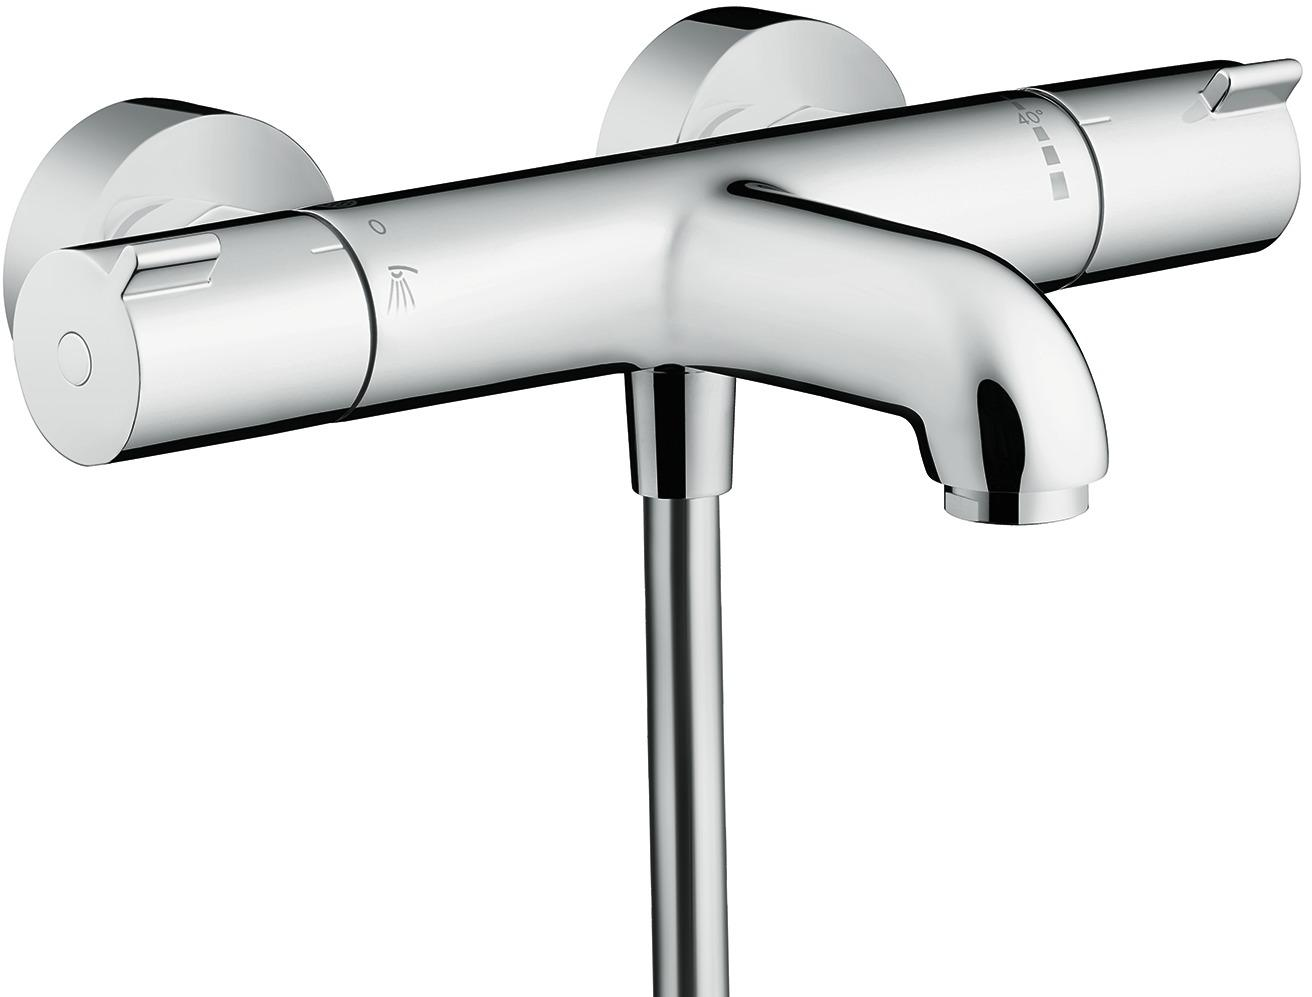 Hansgrohe HG Ecostat 1001 CL voniai | Varle.lt